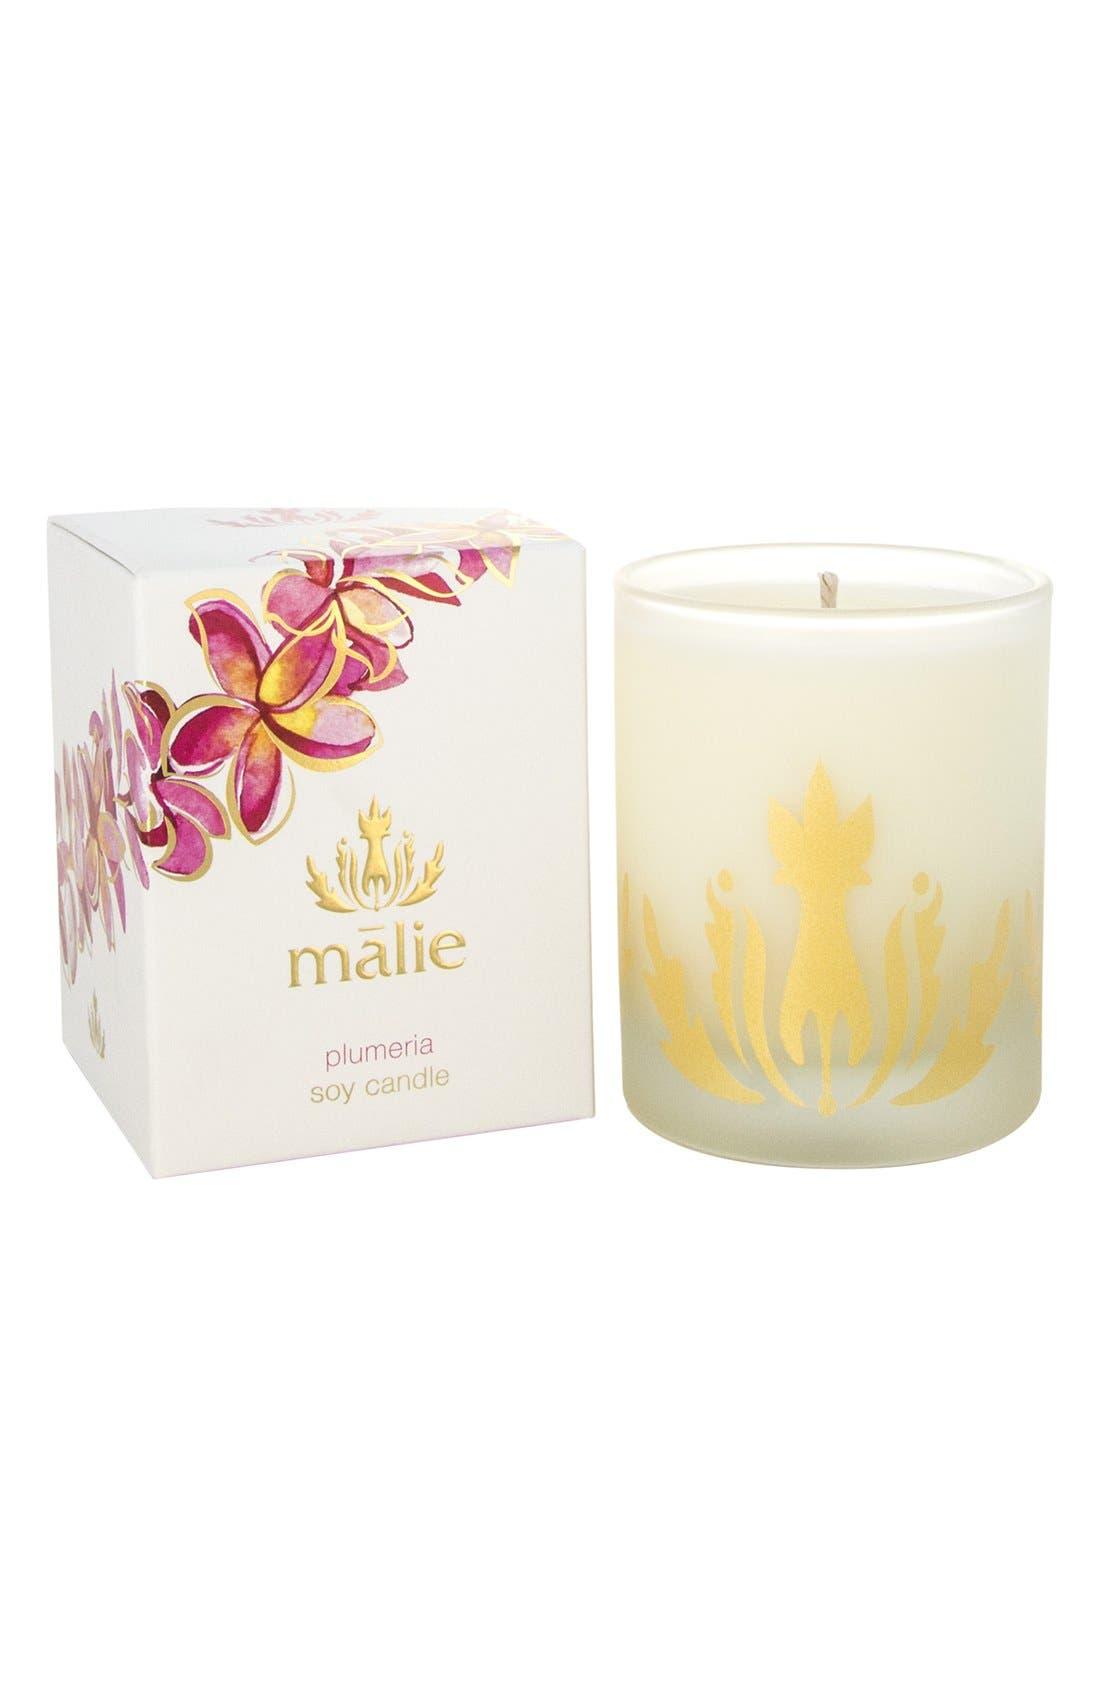 Alternate Image 1 Selected - Malie Organics Plumeria Organic Soy Candle